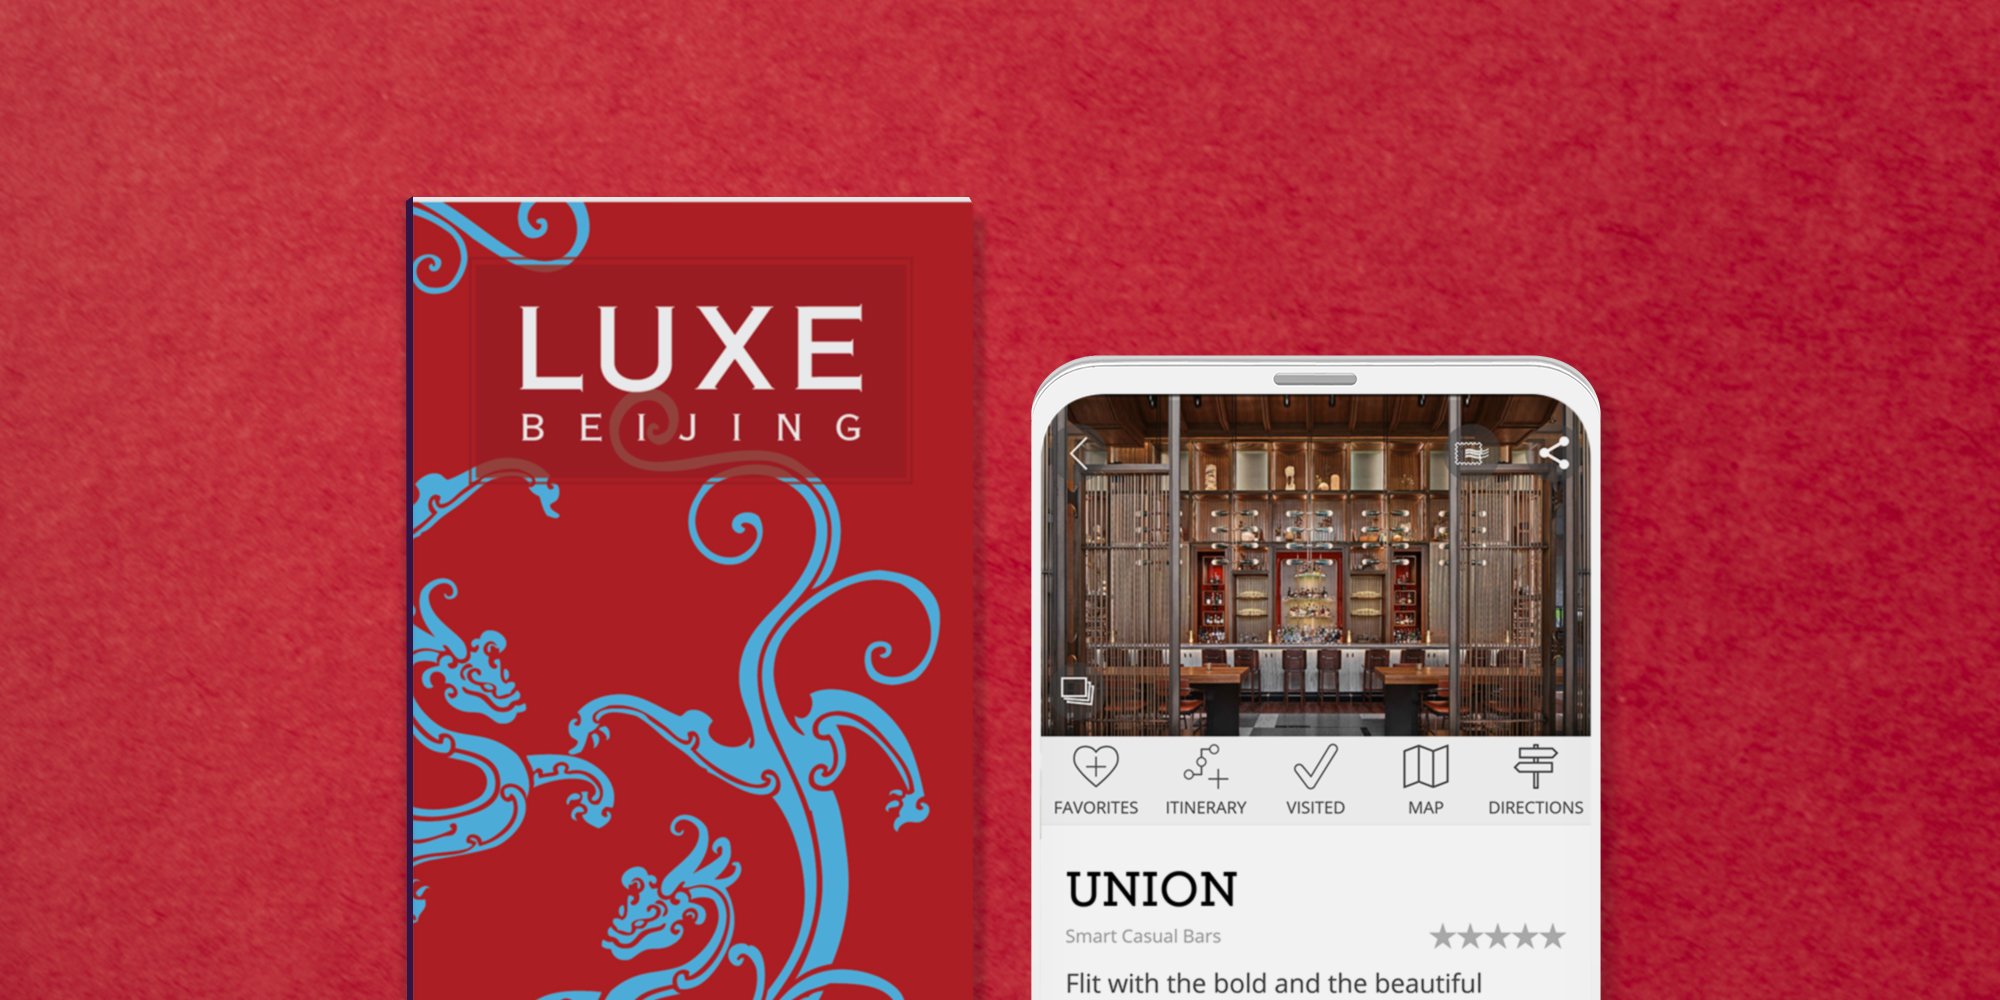 Beijing print guide and digital guide